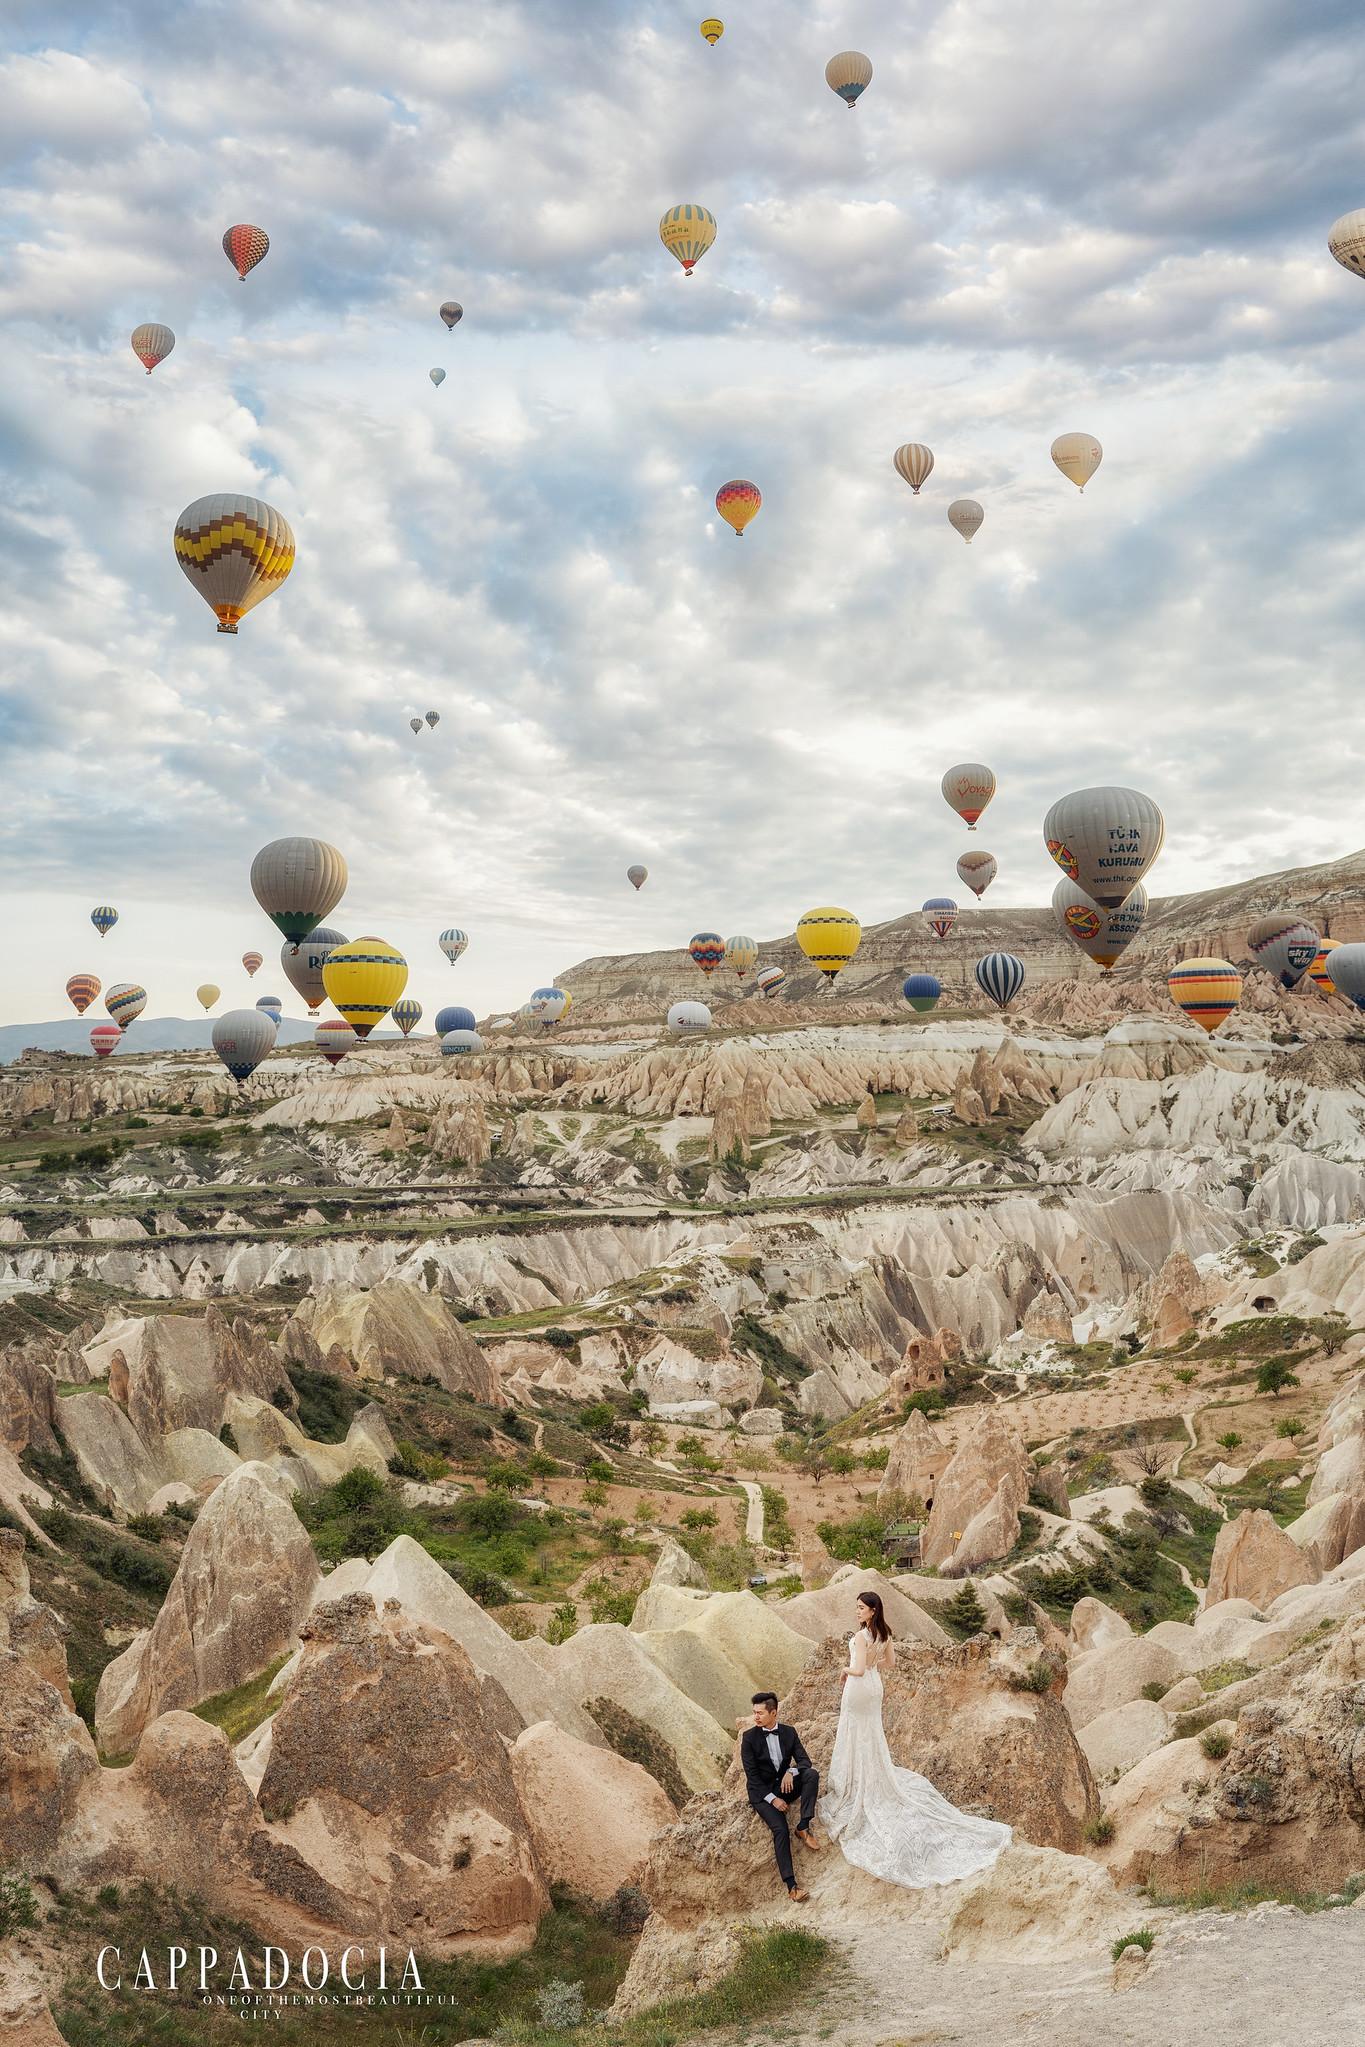 Donfer, 海外婚紗, World tour, 東法, EASTERN WEDDING, 世界旅拍, 卡帕多奇亞 , 熱氣球, Cappadocia, 土耳其婚紗